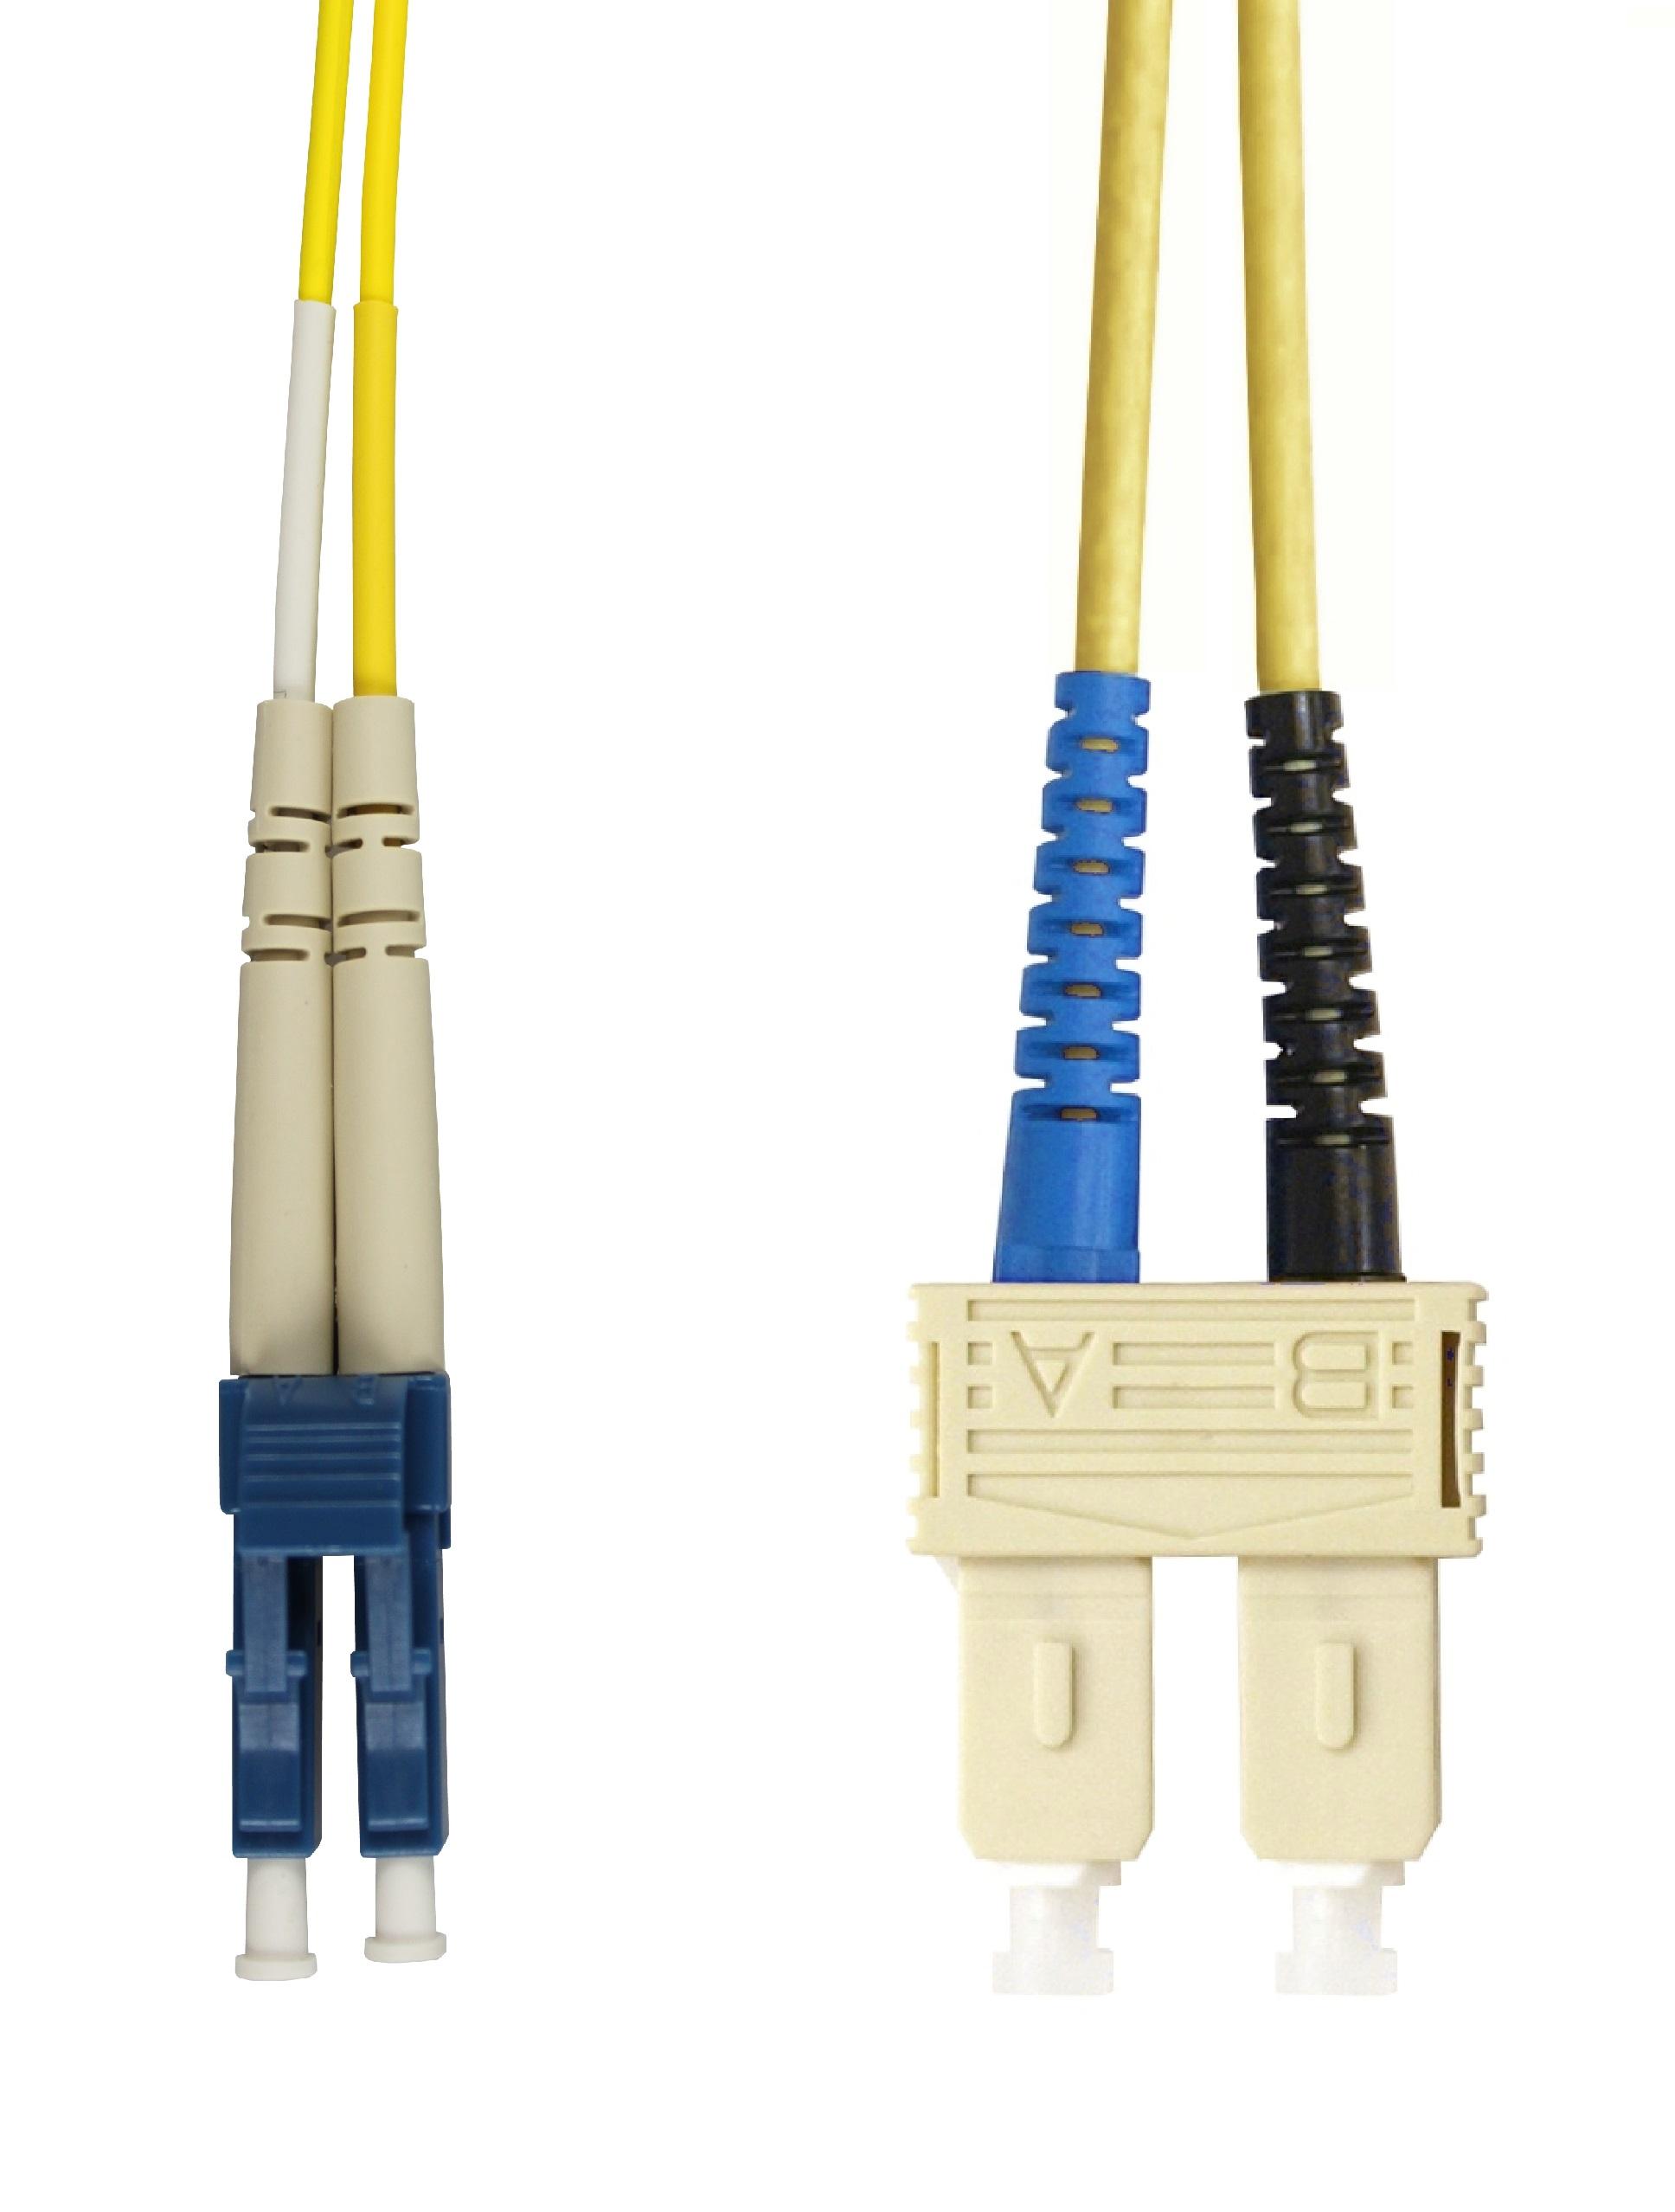 1 Stk LWL Patchkabel Duplex LC/SC, 9/125µm OS2, LS0H-3, gelb, 5.0m HLP29LC05F